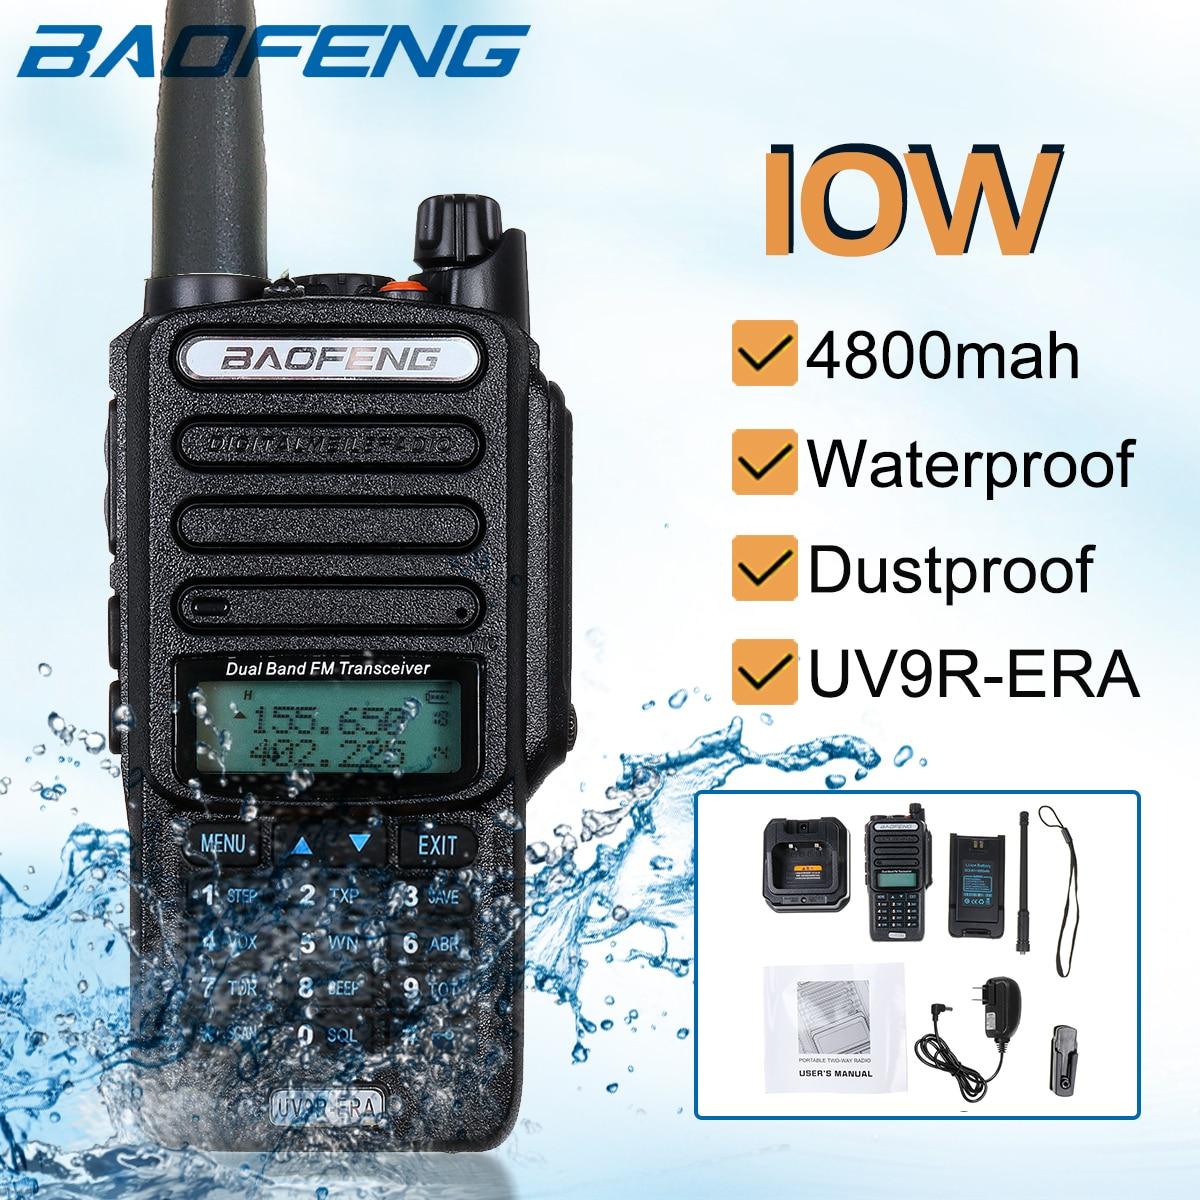 Baofeng UV9R-ERA Walkie Talkie Professional Radio Station Transceiver VHF UHF Portable Radio 15km Talk-Range 4800mah